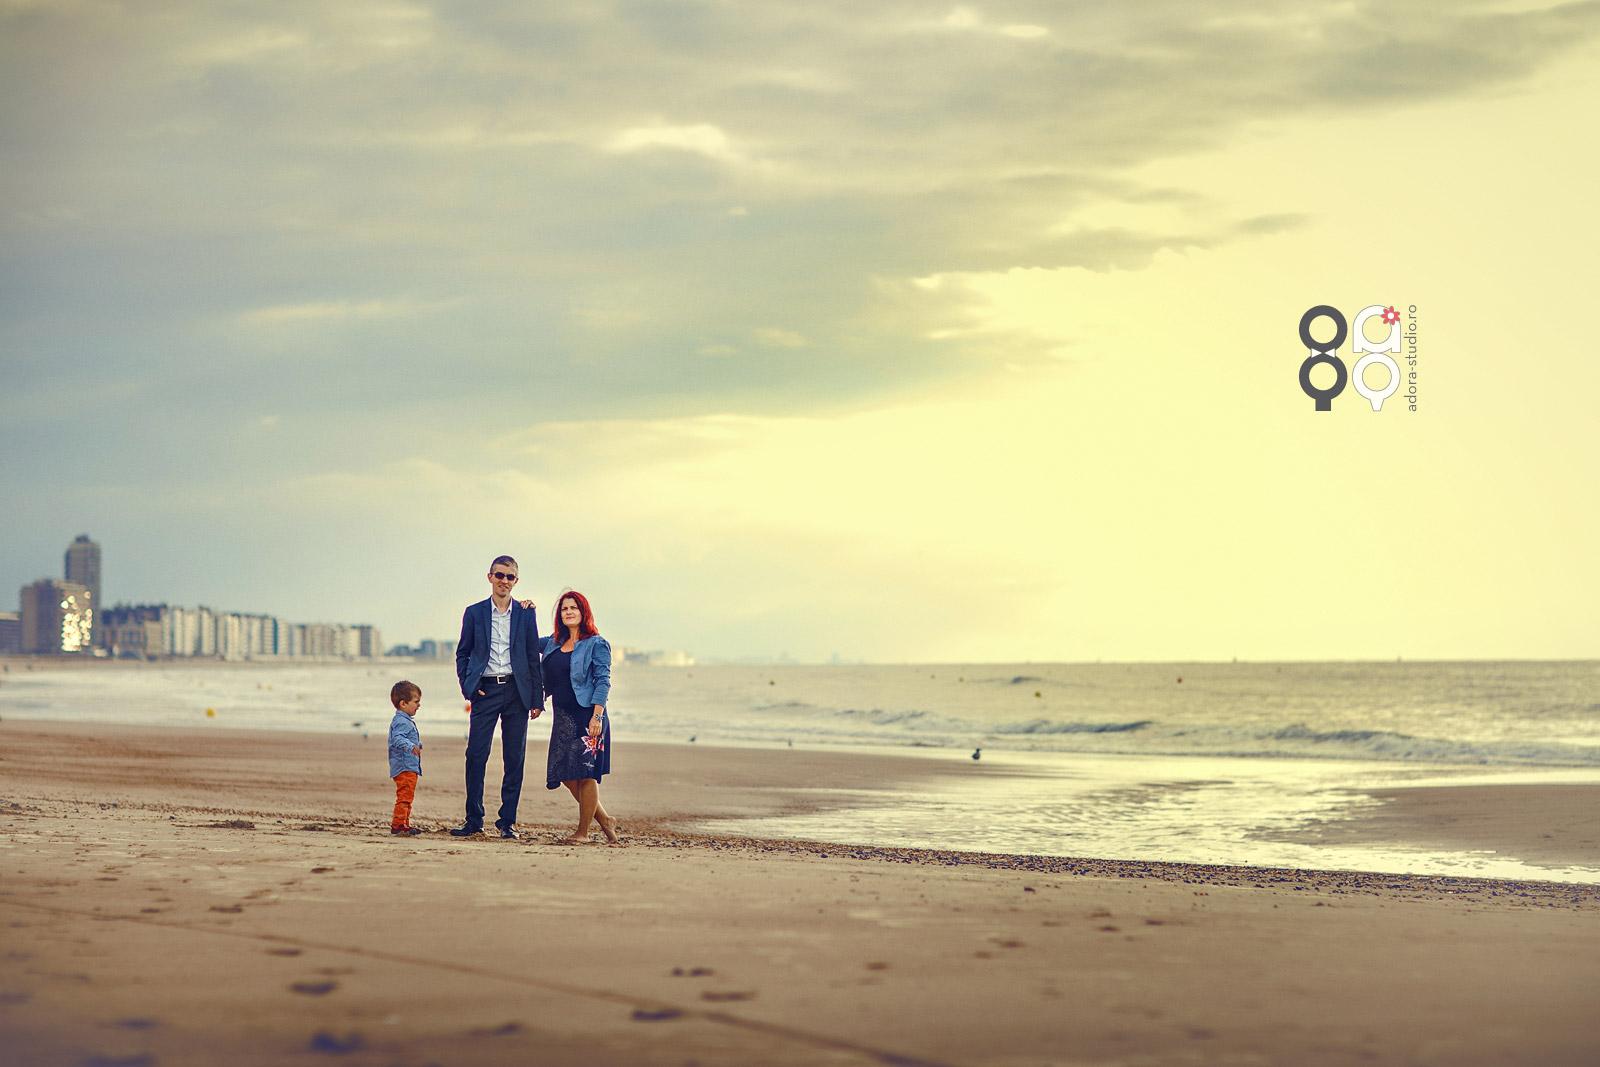 sedinta foto de familie pe plaja